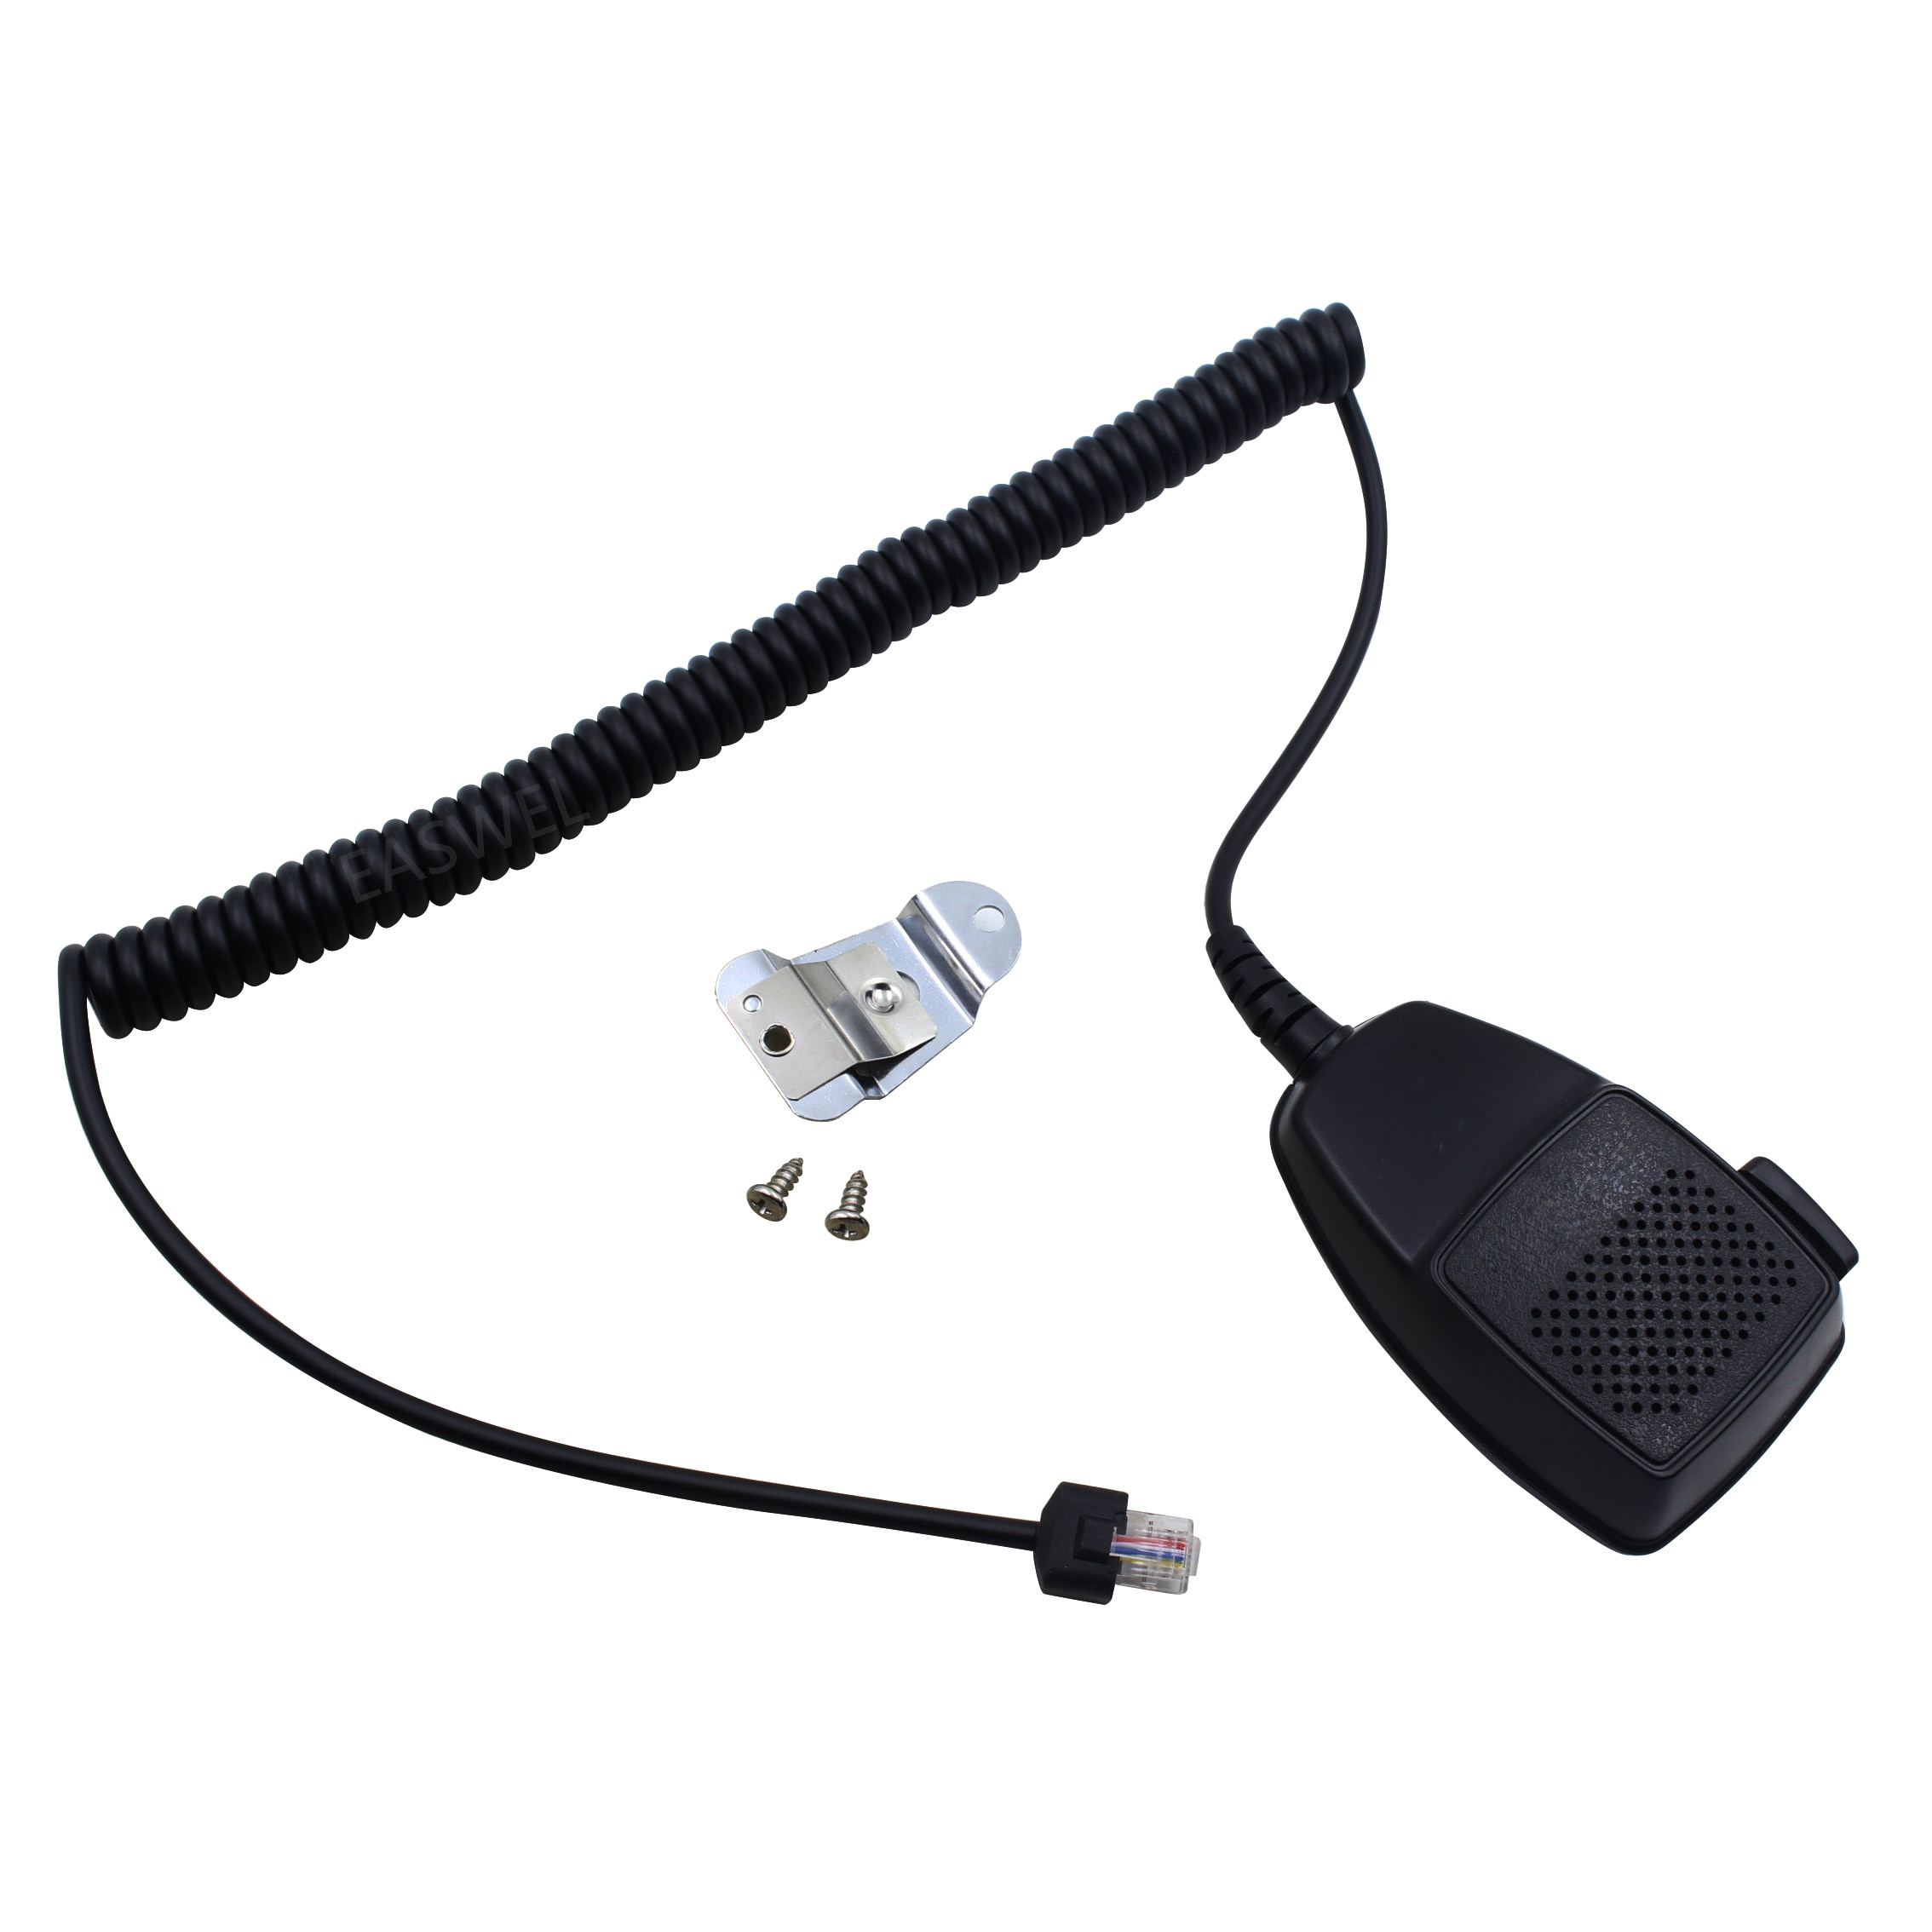 Динамик микрофон для Motorola GTX Mobile LCS2000 LTS2000 M10 M100 M130 M200 M400 MaraTrac MaxTrac MC2100 MC900 MCS2000